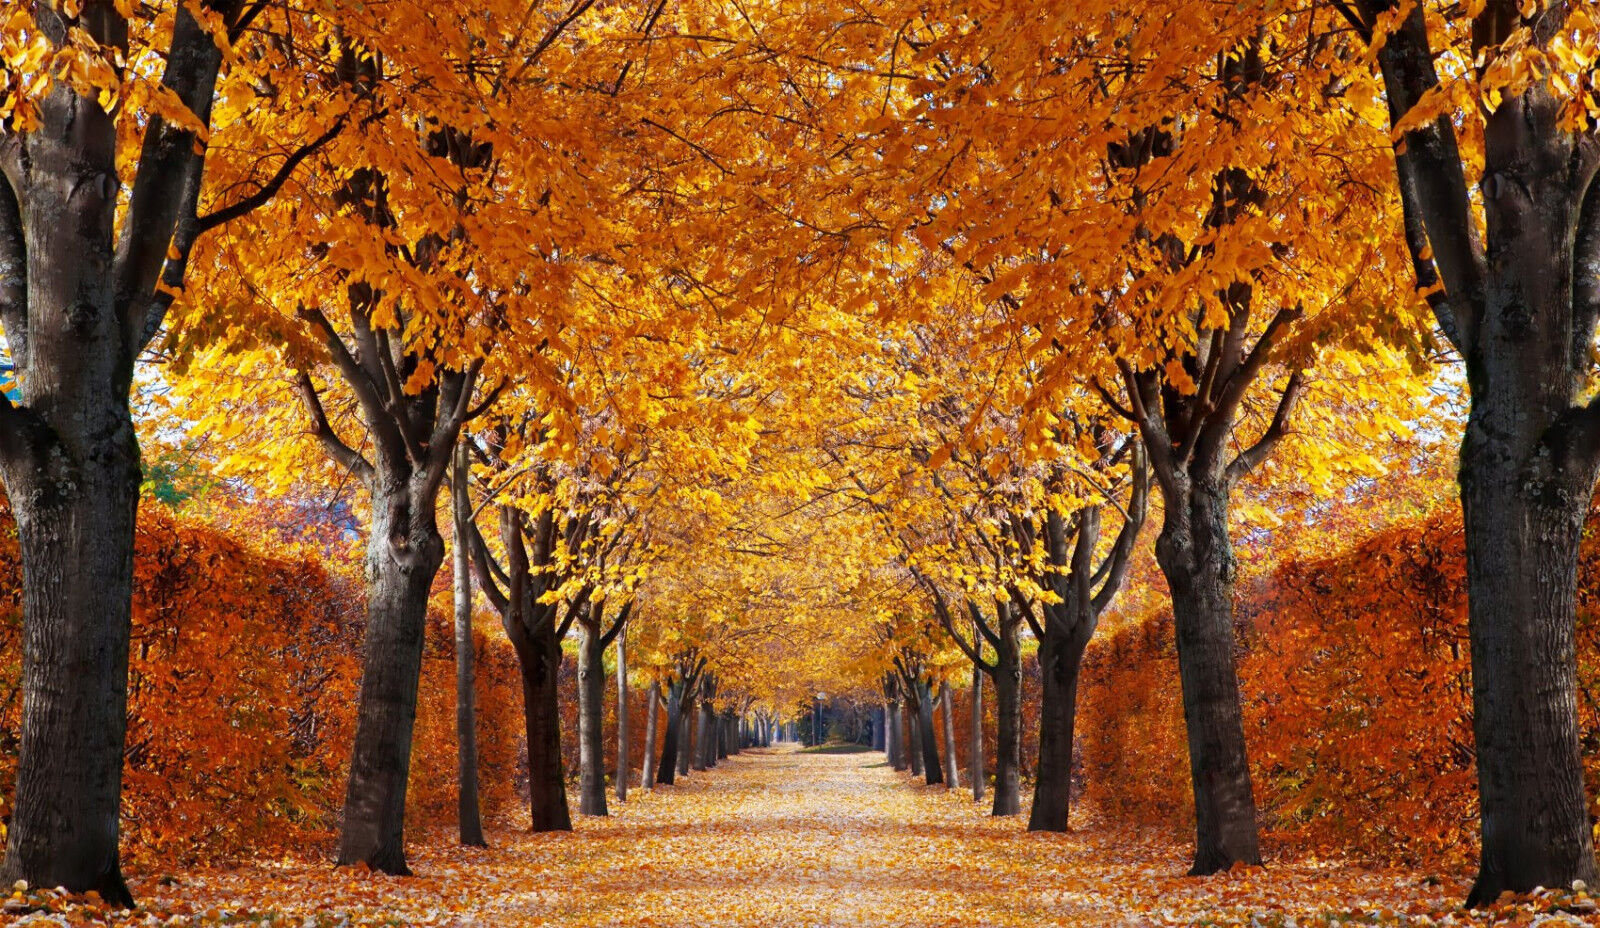 VLIES Fototapete-HERBST ALLEE-(333V)-350x260cm-7Bahnen 50x260-Bäume Allee Garten